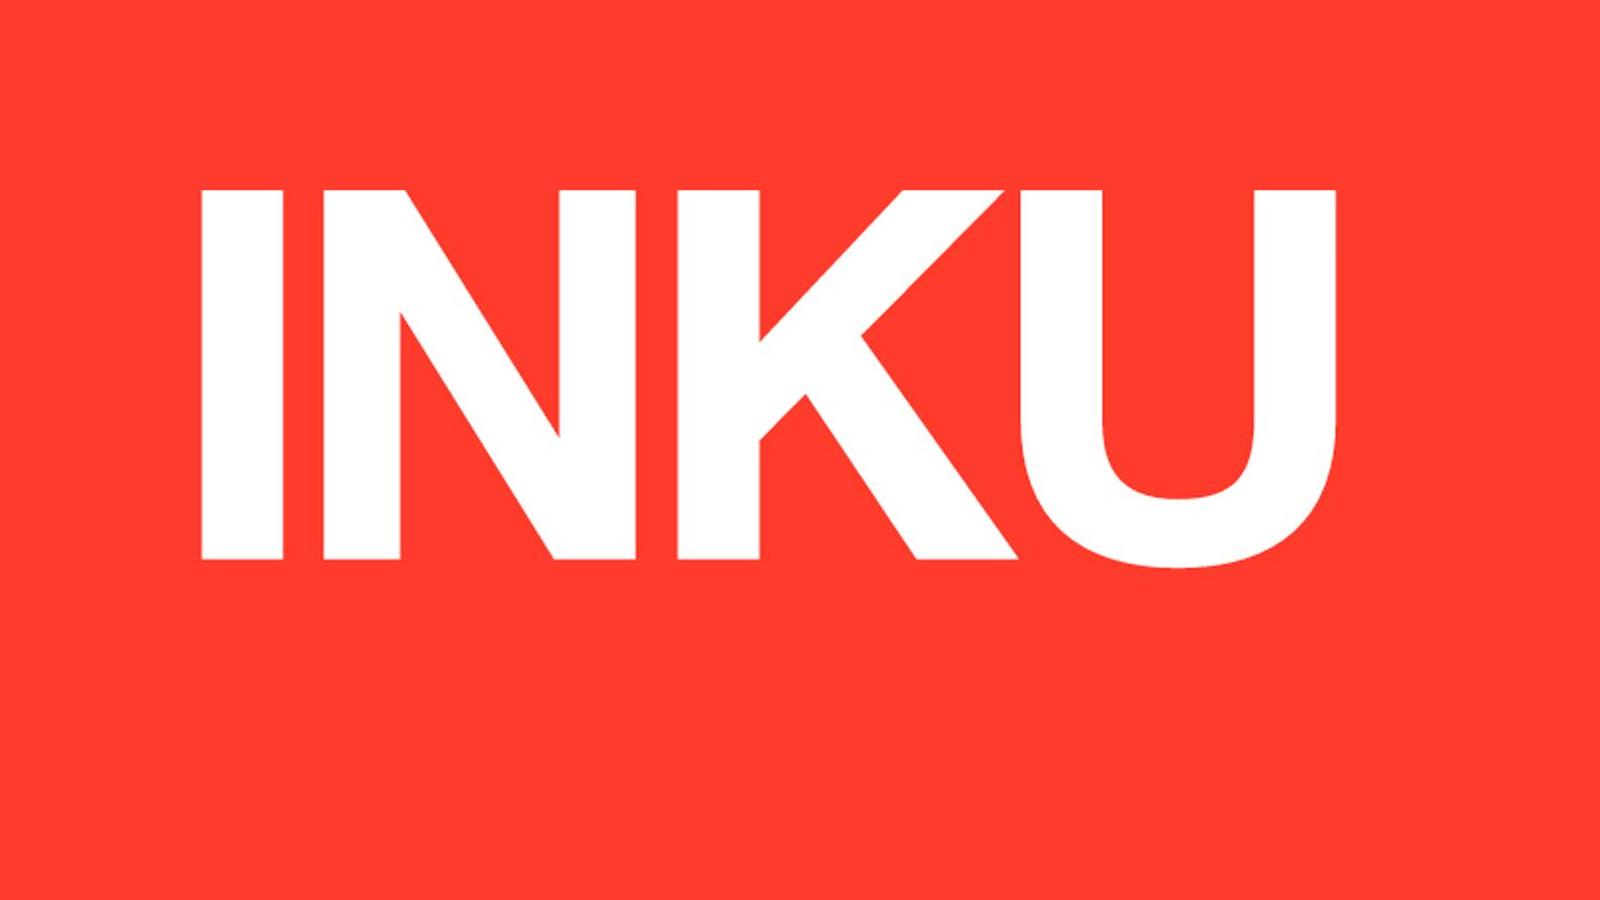 inku_01_1600x900